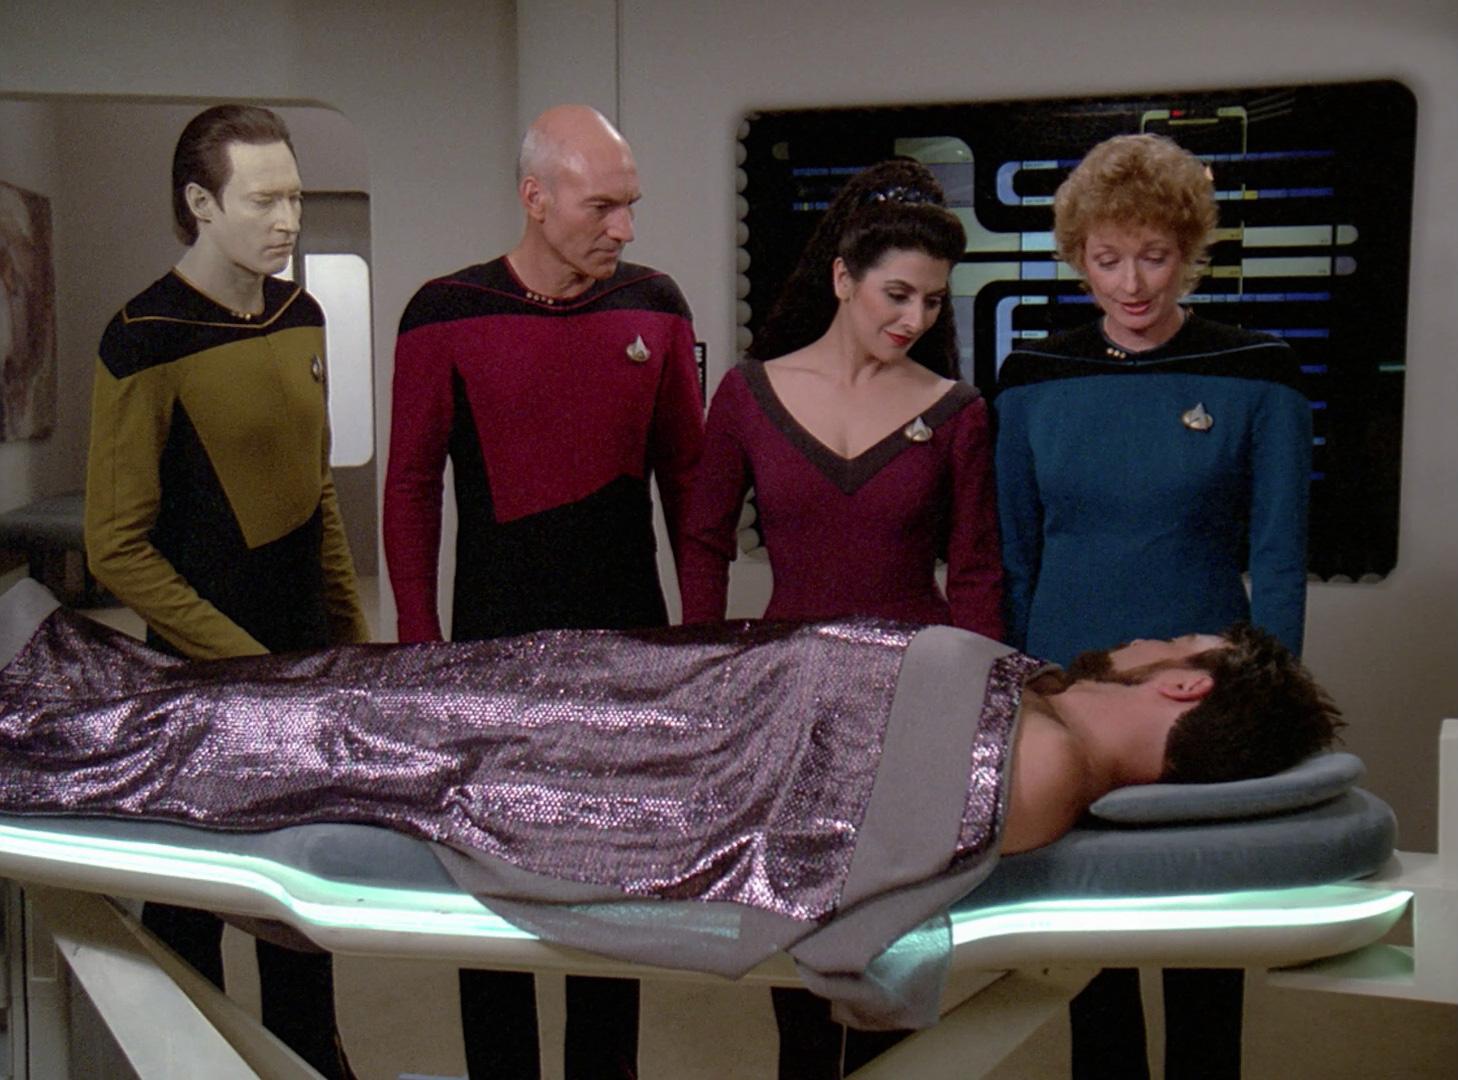 Star Trek - The Next Generation - saison 2 - 23